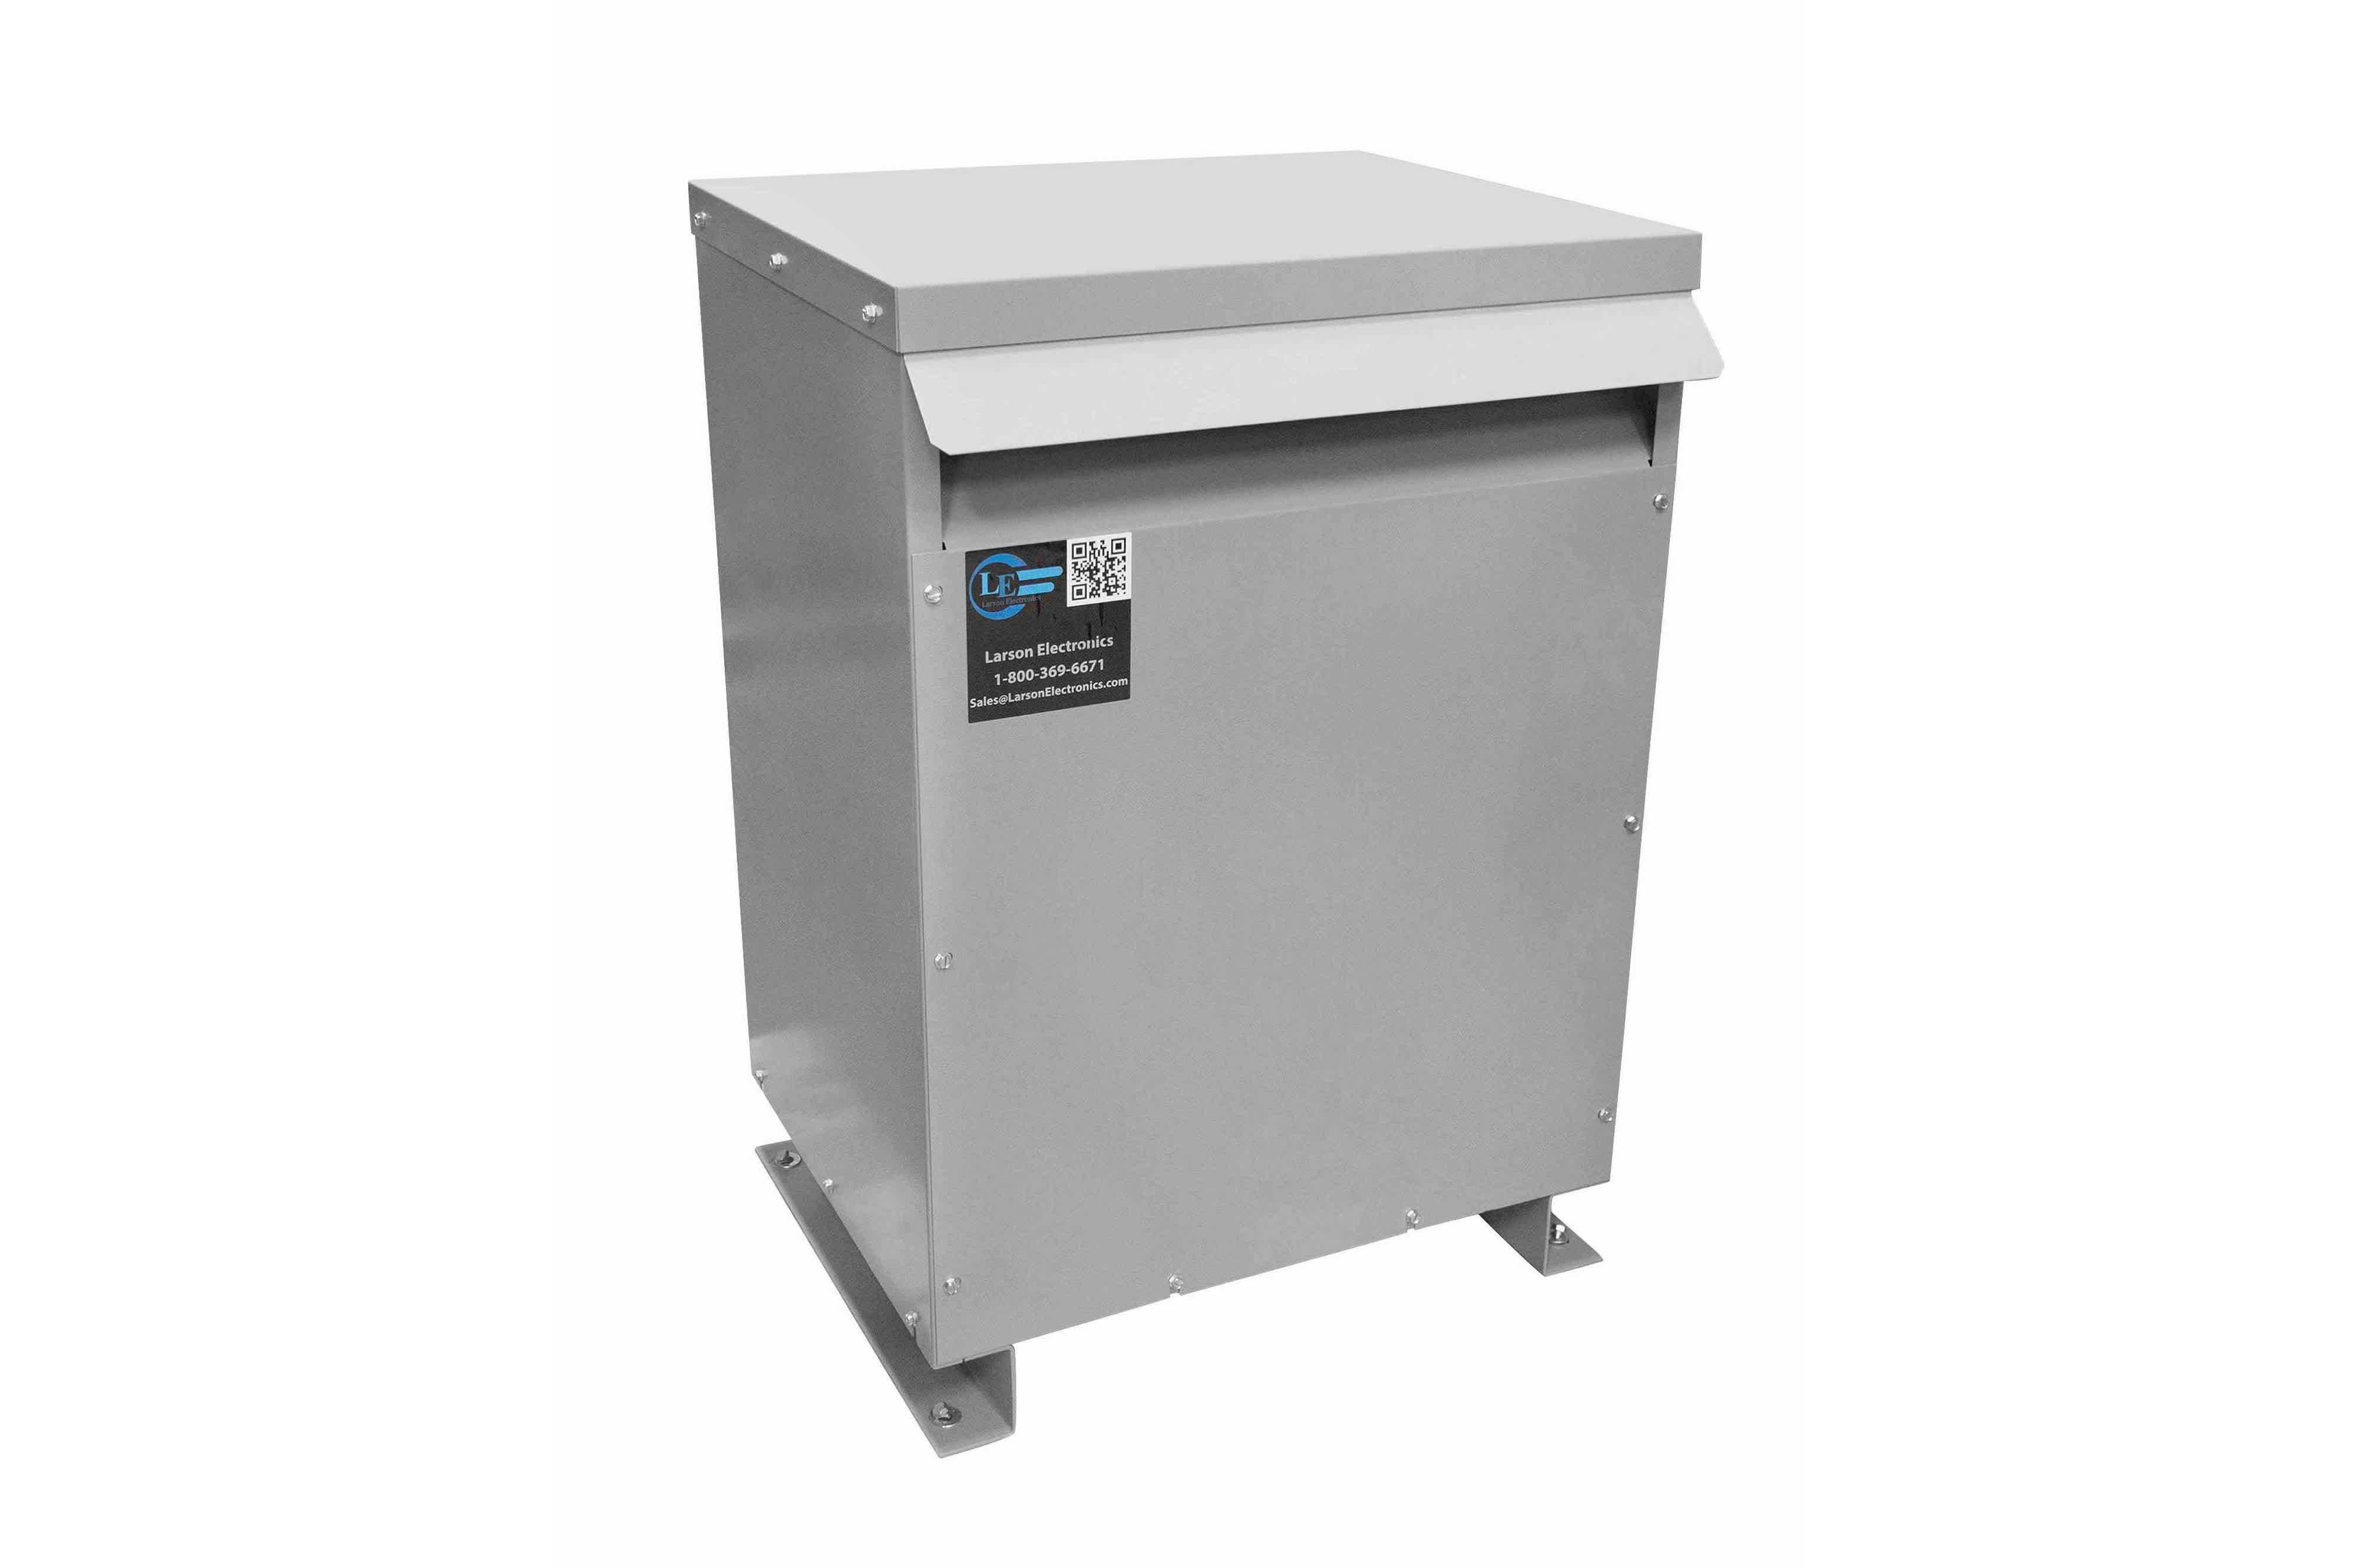 400 kVA 3PH Isolation Transformer, 575V Wye Primary, 400V Delta Secondary, N3R, Ventilated, 60 Hz